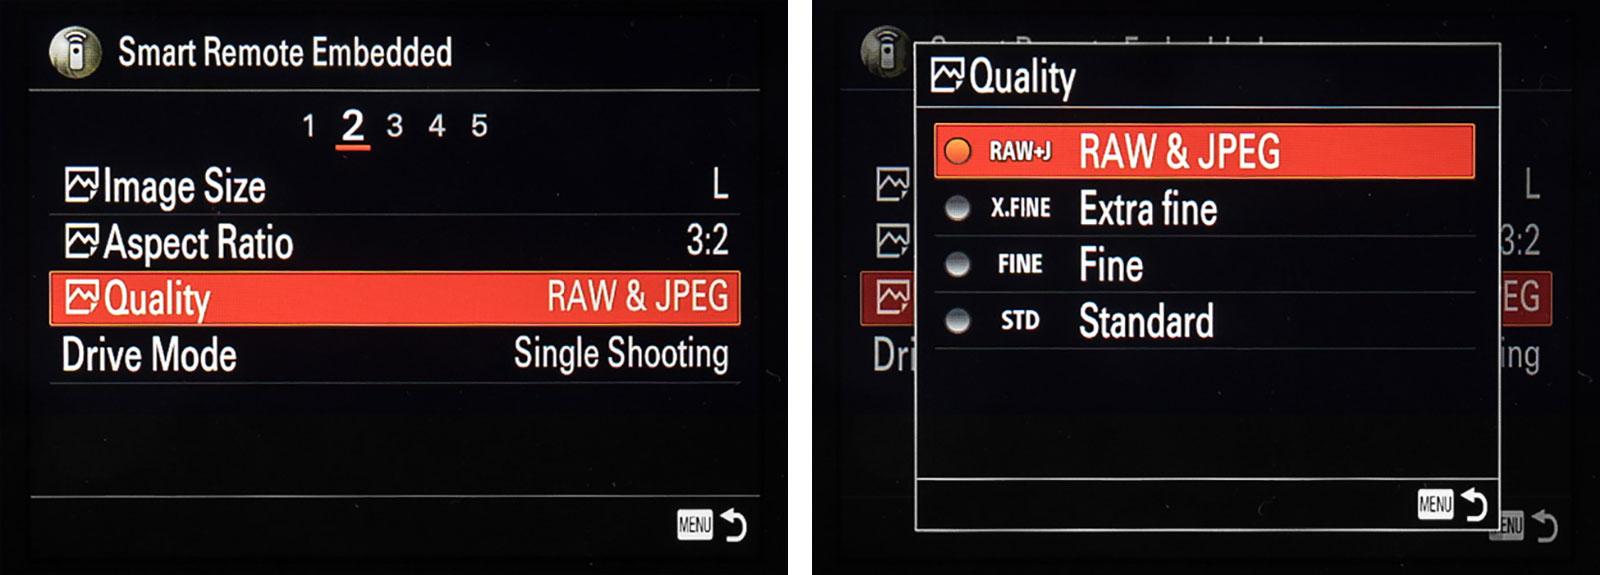 Sony Remote Camera Control menu settings